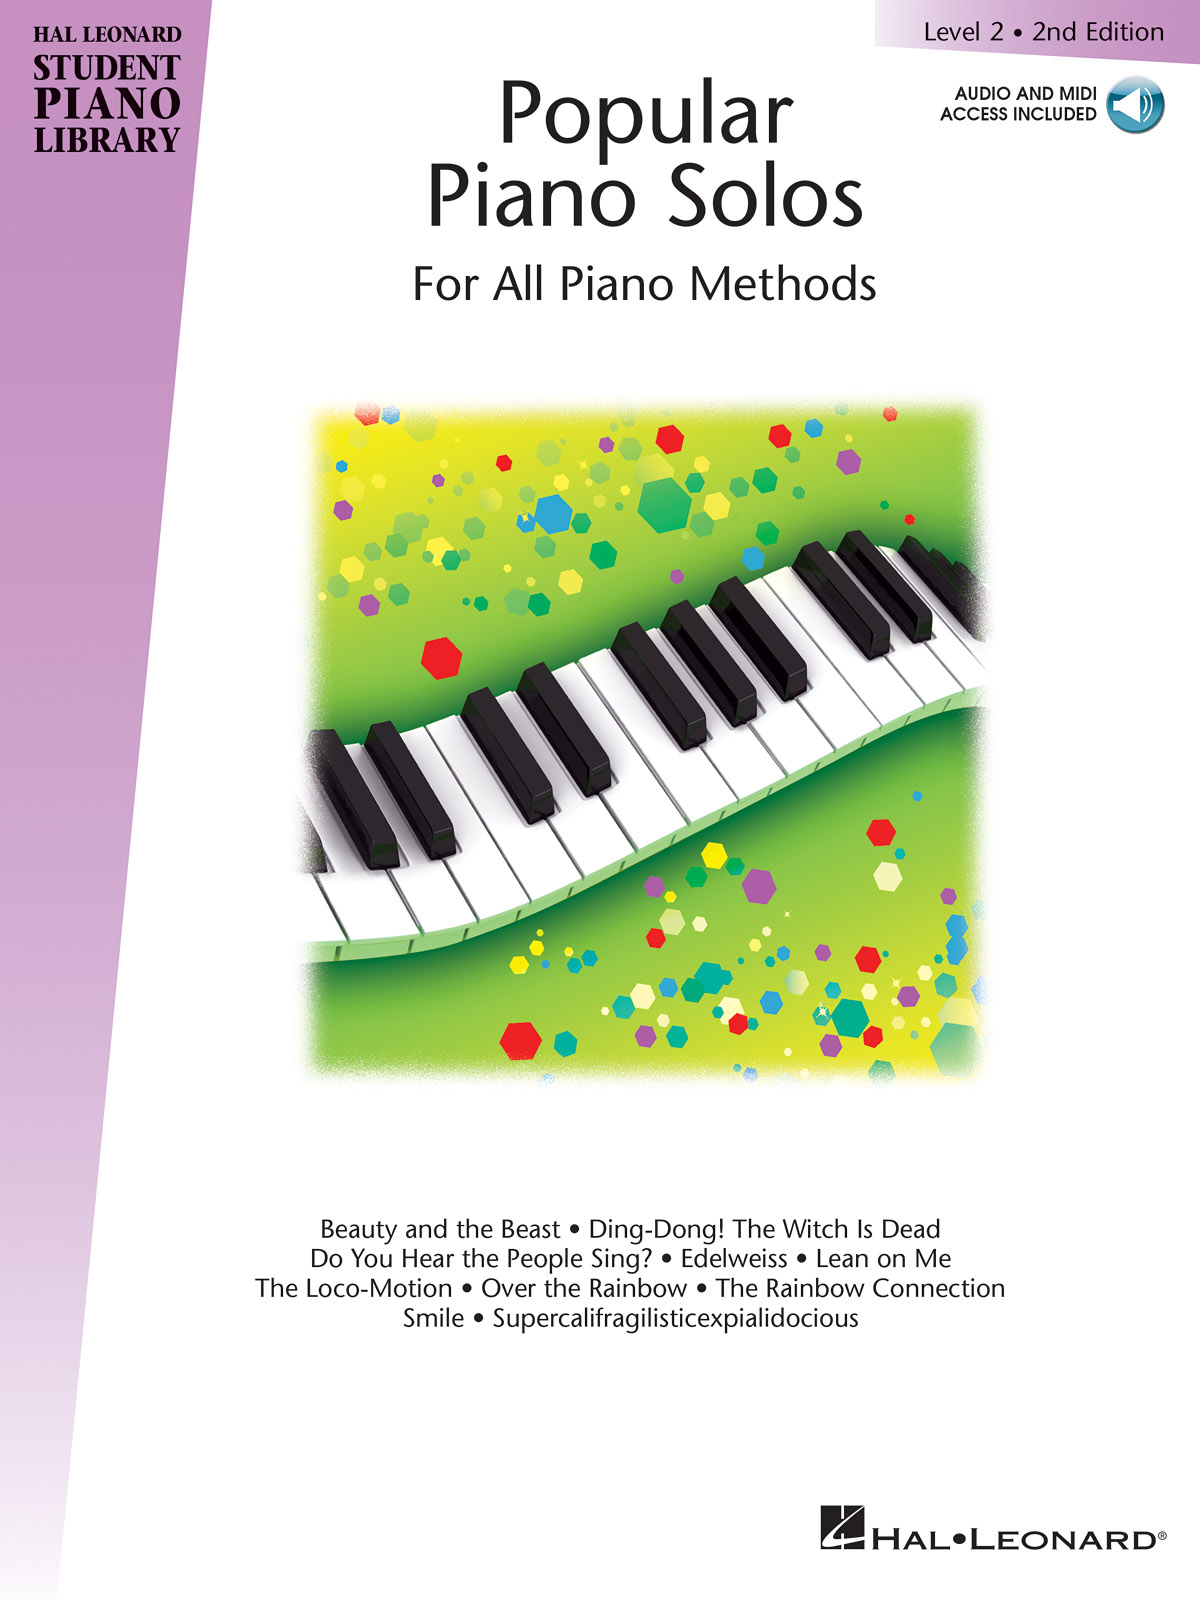 Popular Piano Solos 2nd Edition - Level 2: Piano: Instrumental Album